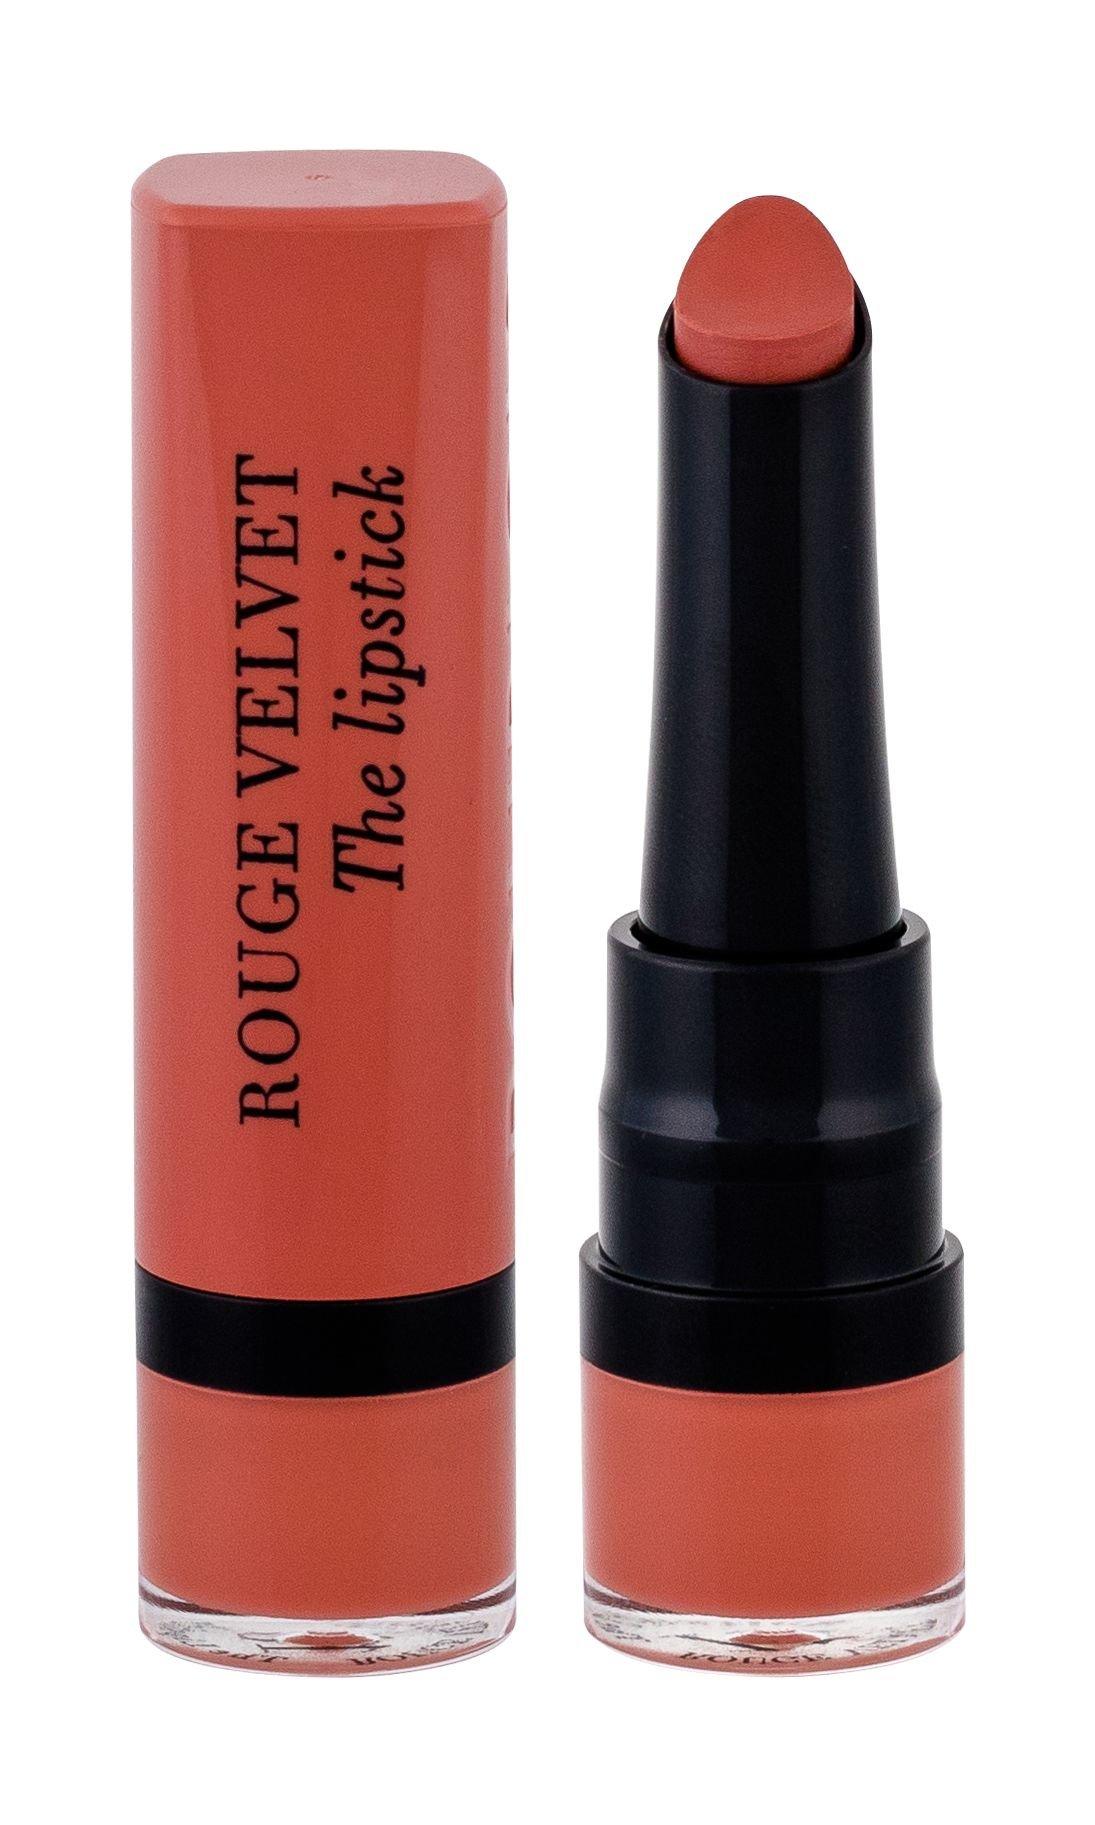 BOURJOIS Paris Rouge Velvet Lipstick 2,4ml 15 Peach Tatin